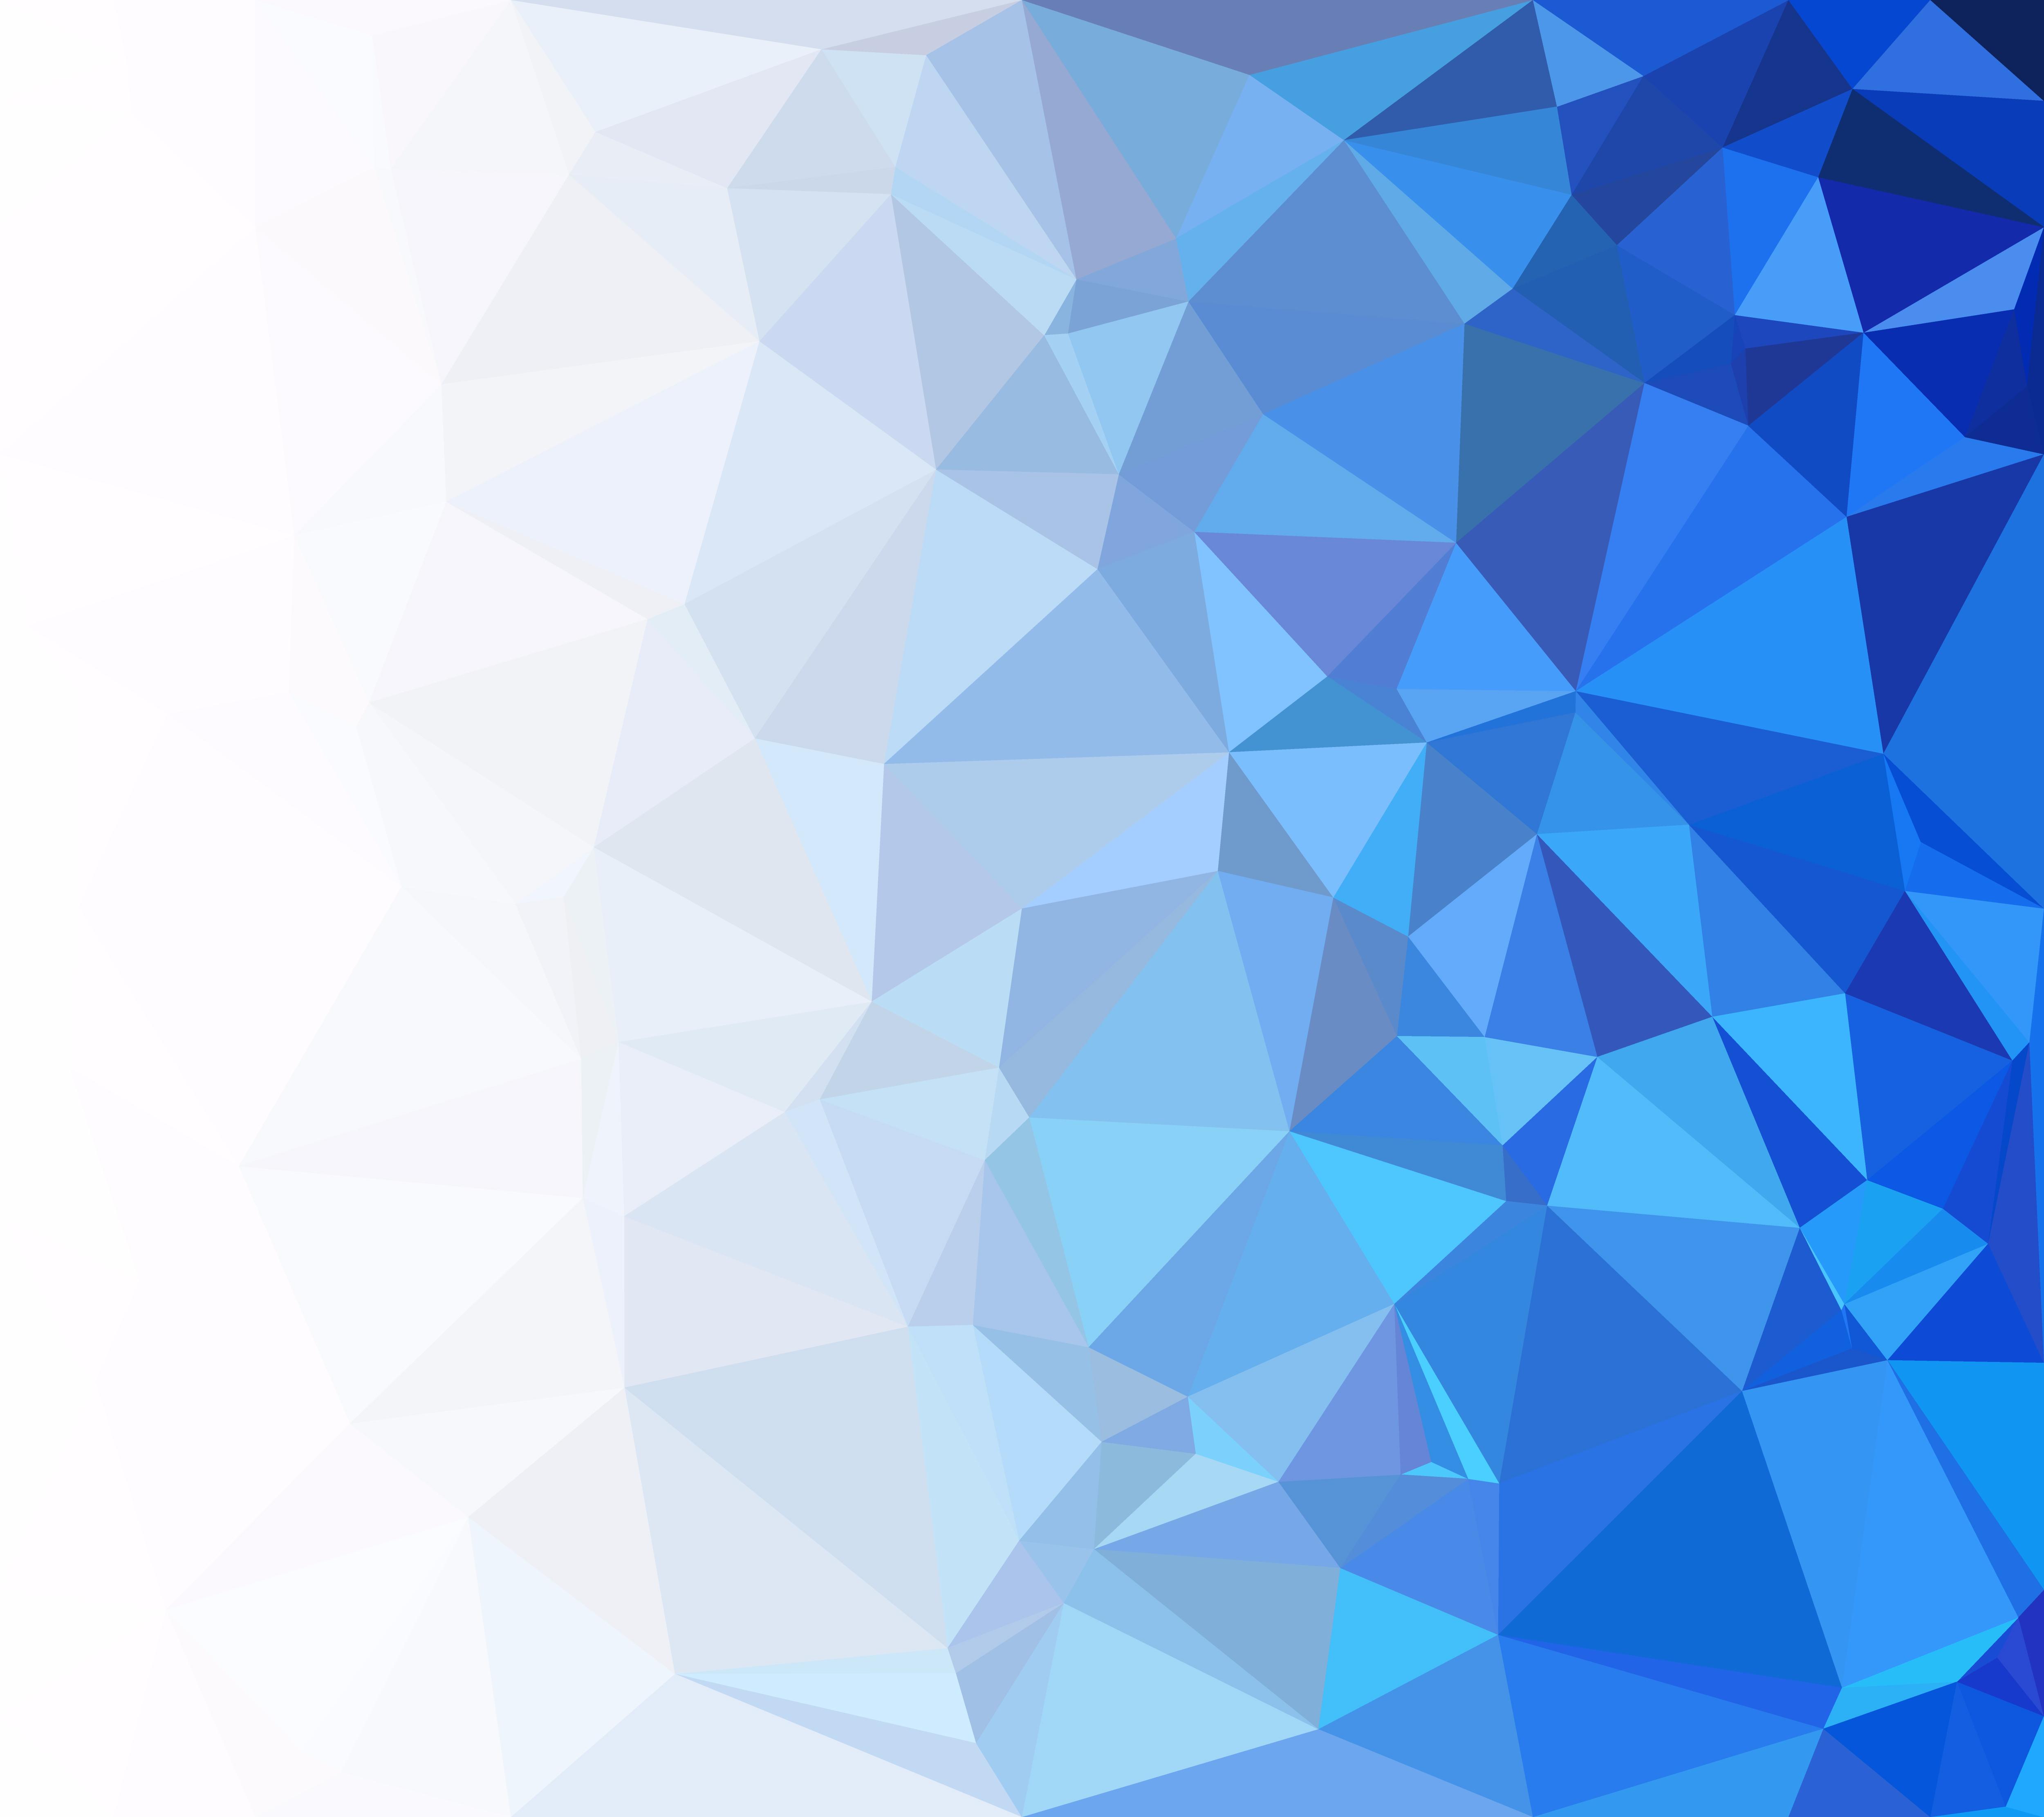 Blue Polygonal Mosaic Background, Creative Design